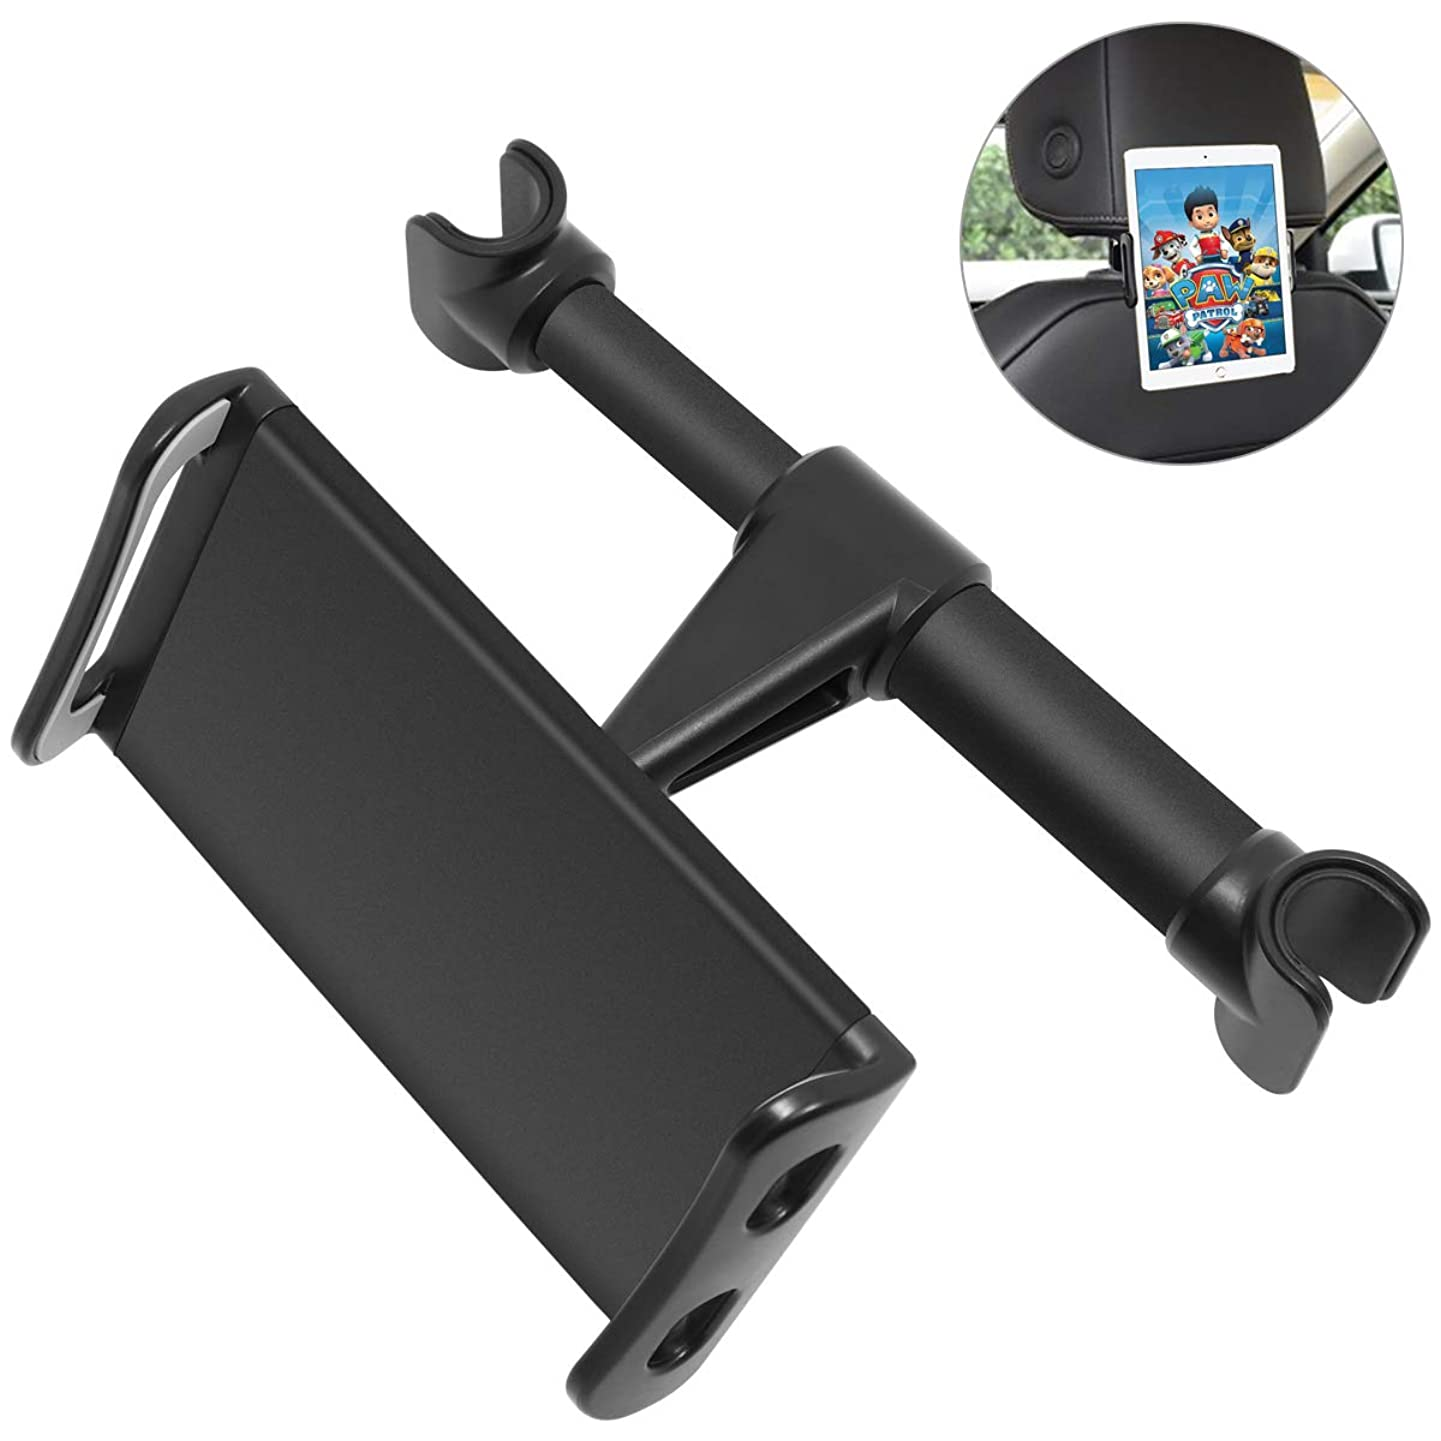 Car Headrest Mount, DERIMIZZ Car Seat Tablet Holder Tablet Headrest Holder Backseat Holder for Kids, Compatible with Smartphones Tablets Switch 4.5